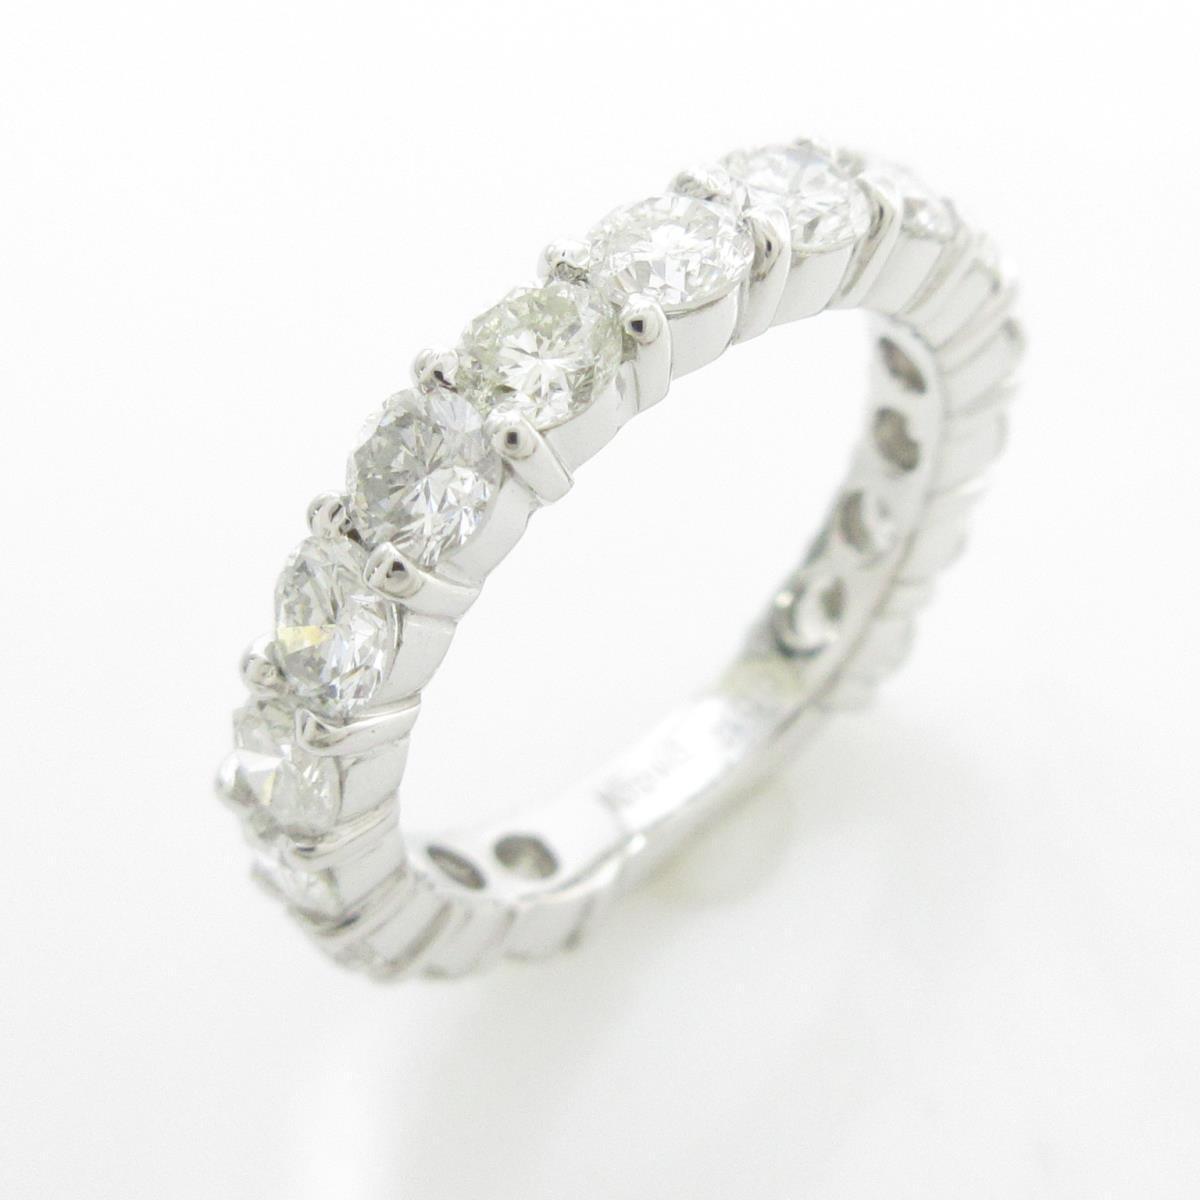 K18WG ハーフエタニティ ダイヤモンドリング【中古】